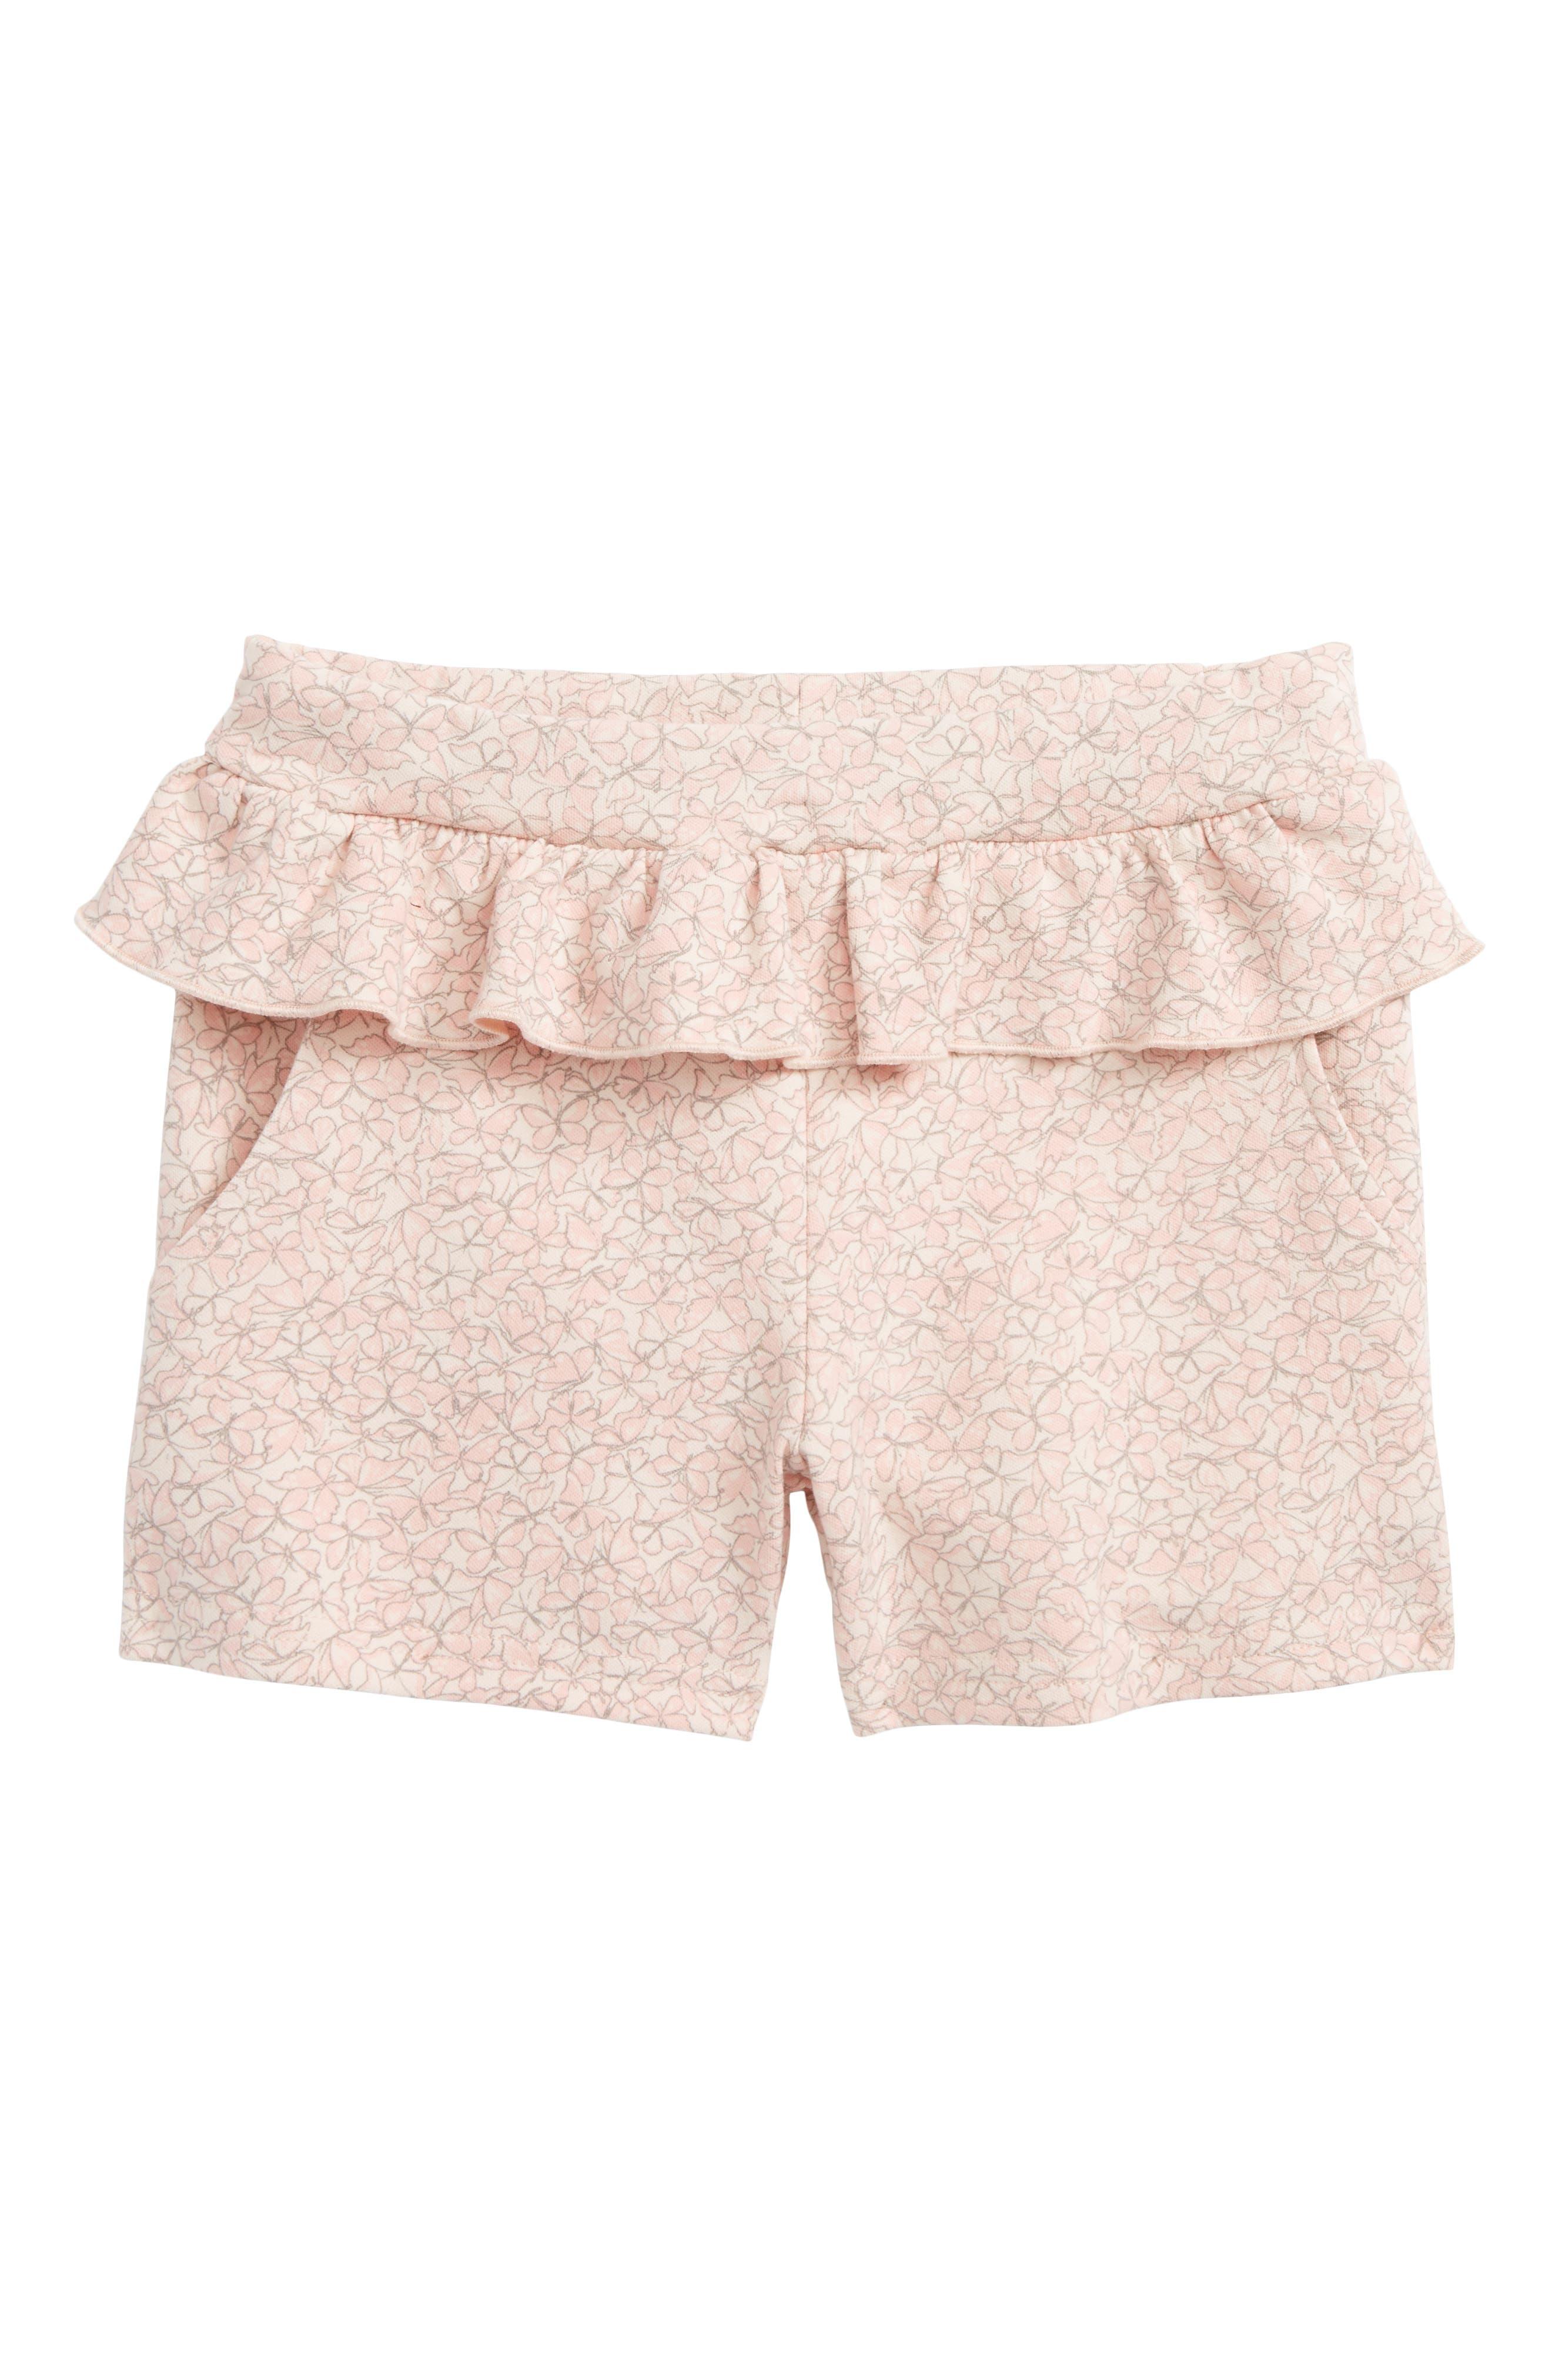 Butterfly Ruffle Shorts,                             Main thumbnail 1, color,                             2400 Powder